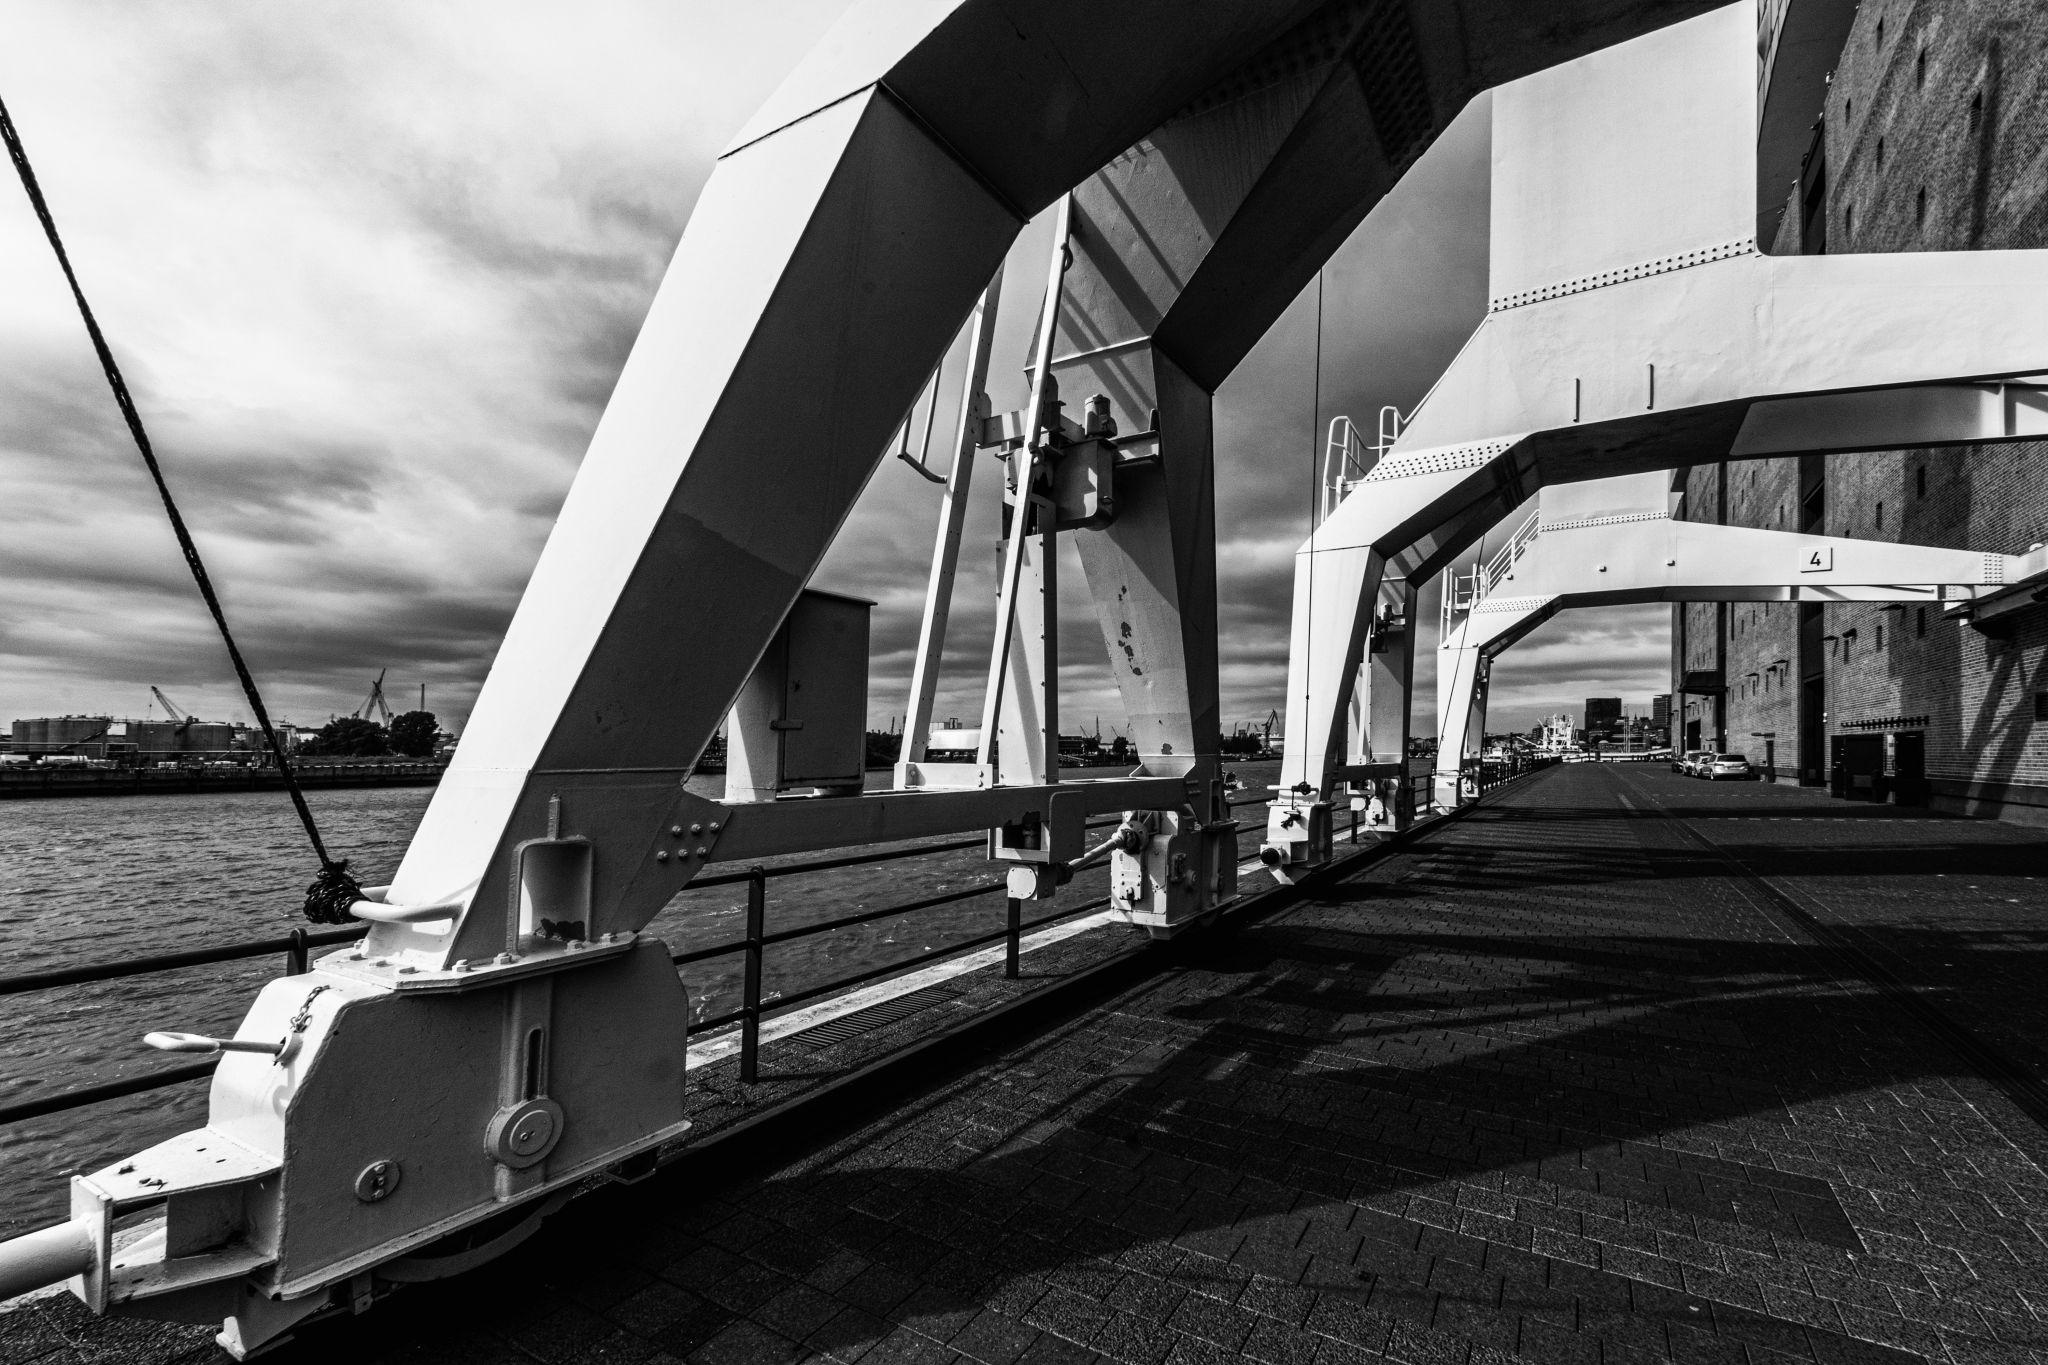 Elbphilharmonie, Waterfront, Germany